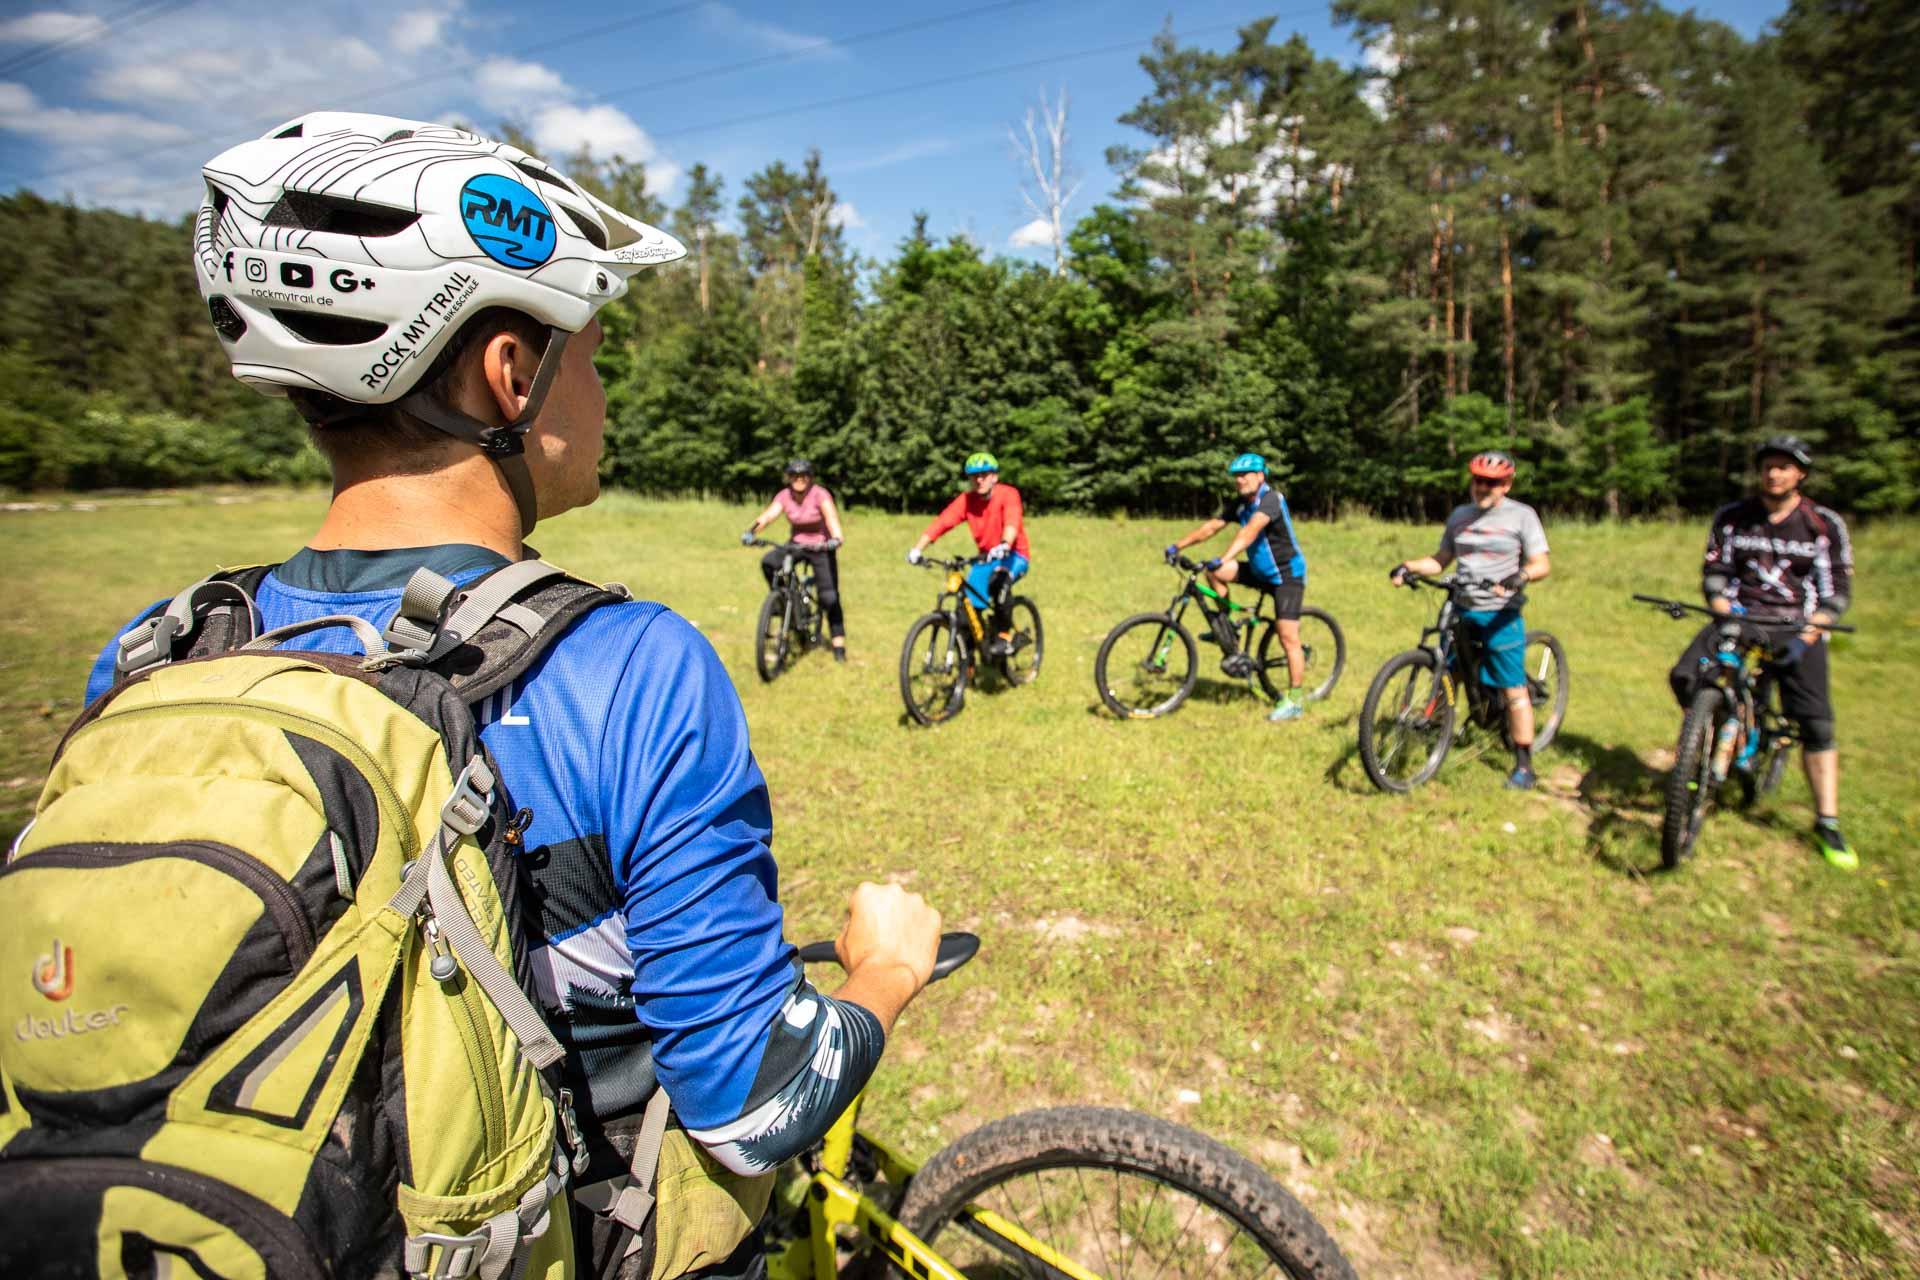 eMTB eBike Fortgeschritten Fahrtechnik Kurs in Siegen - Rock my Trail Bikeschule317